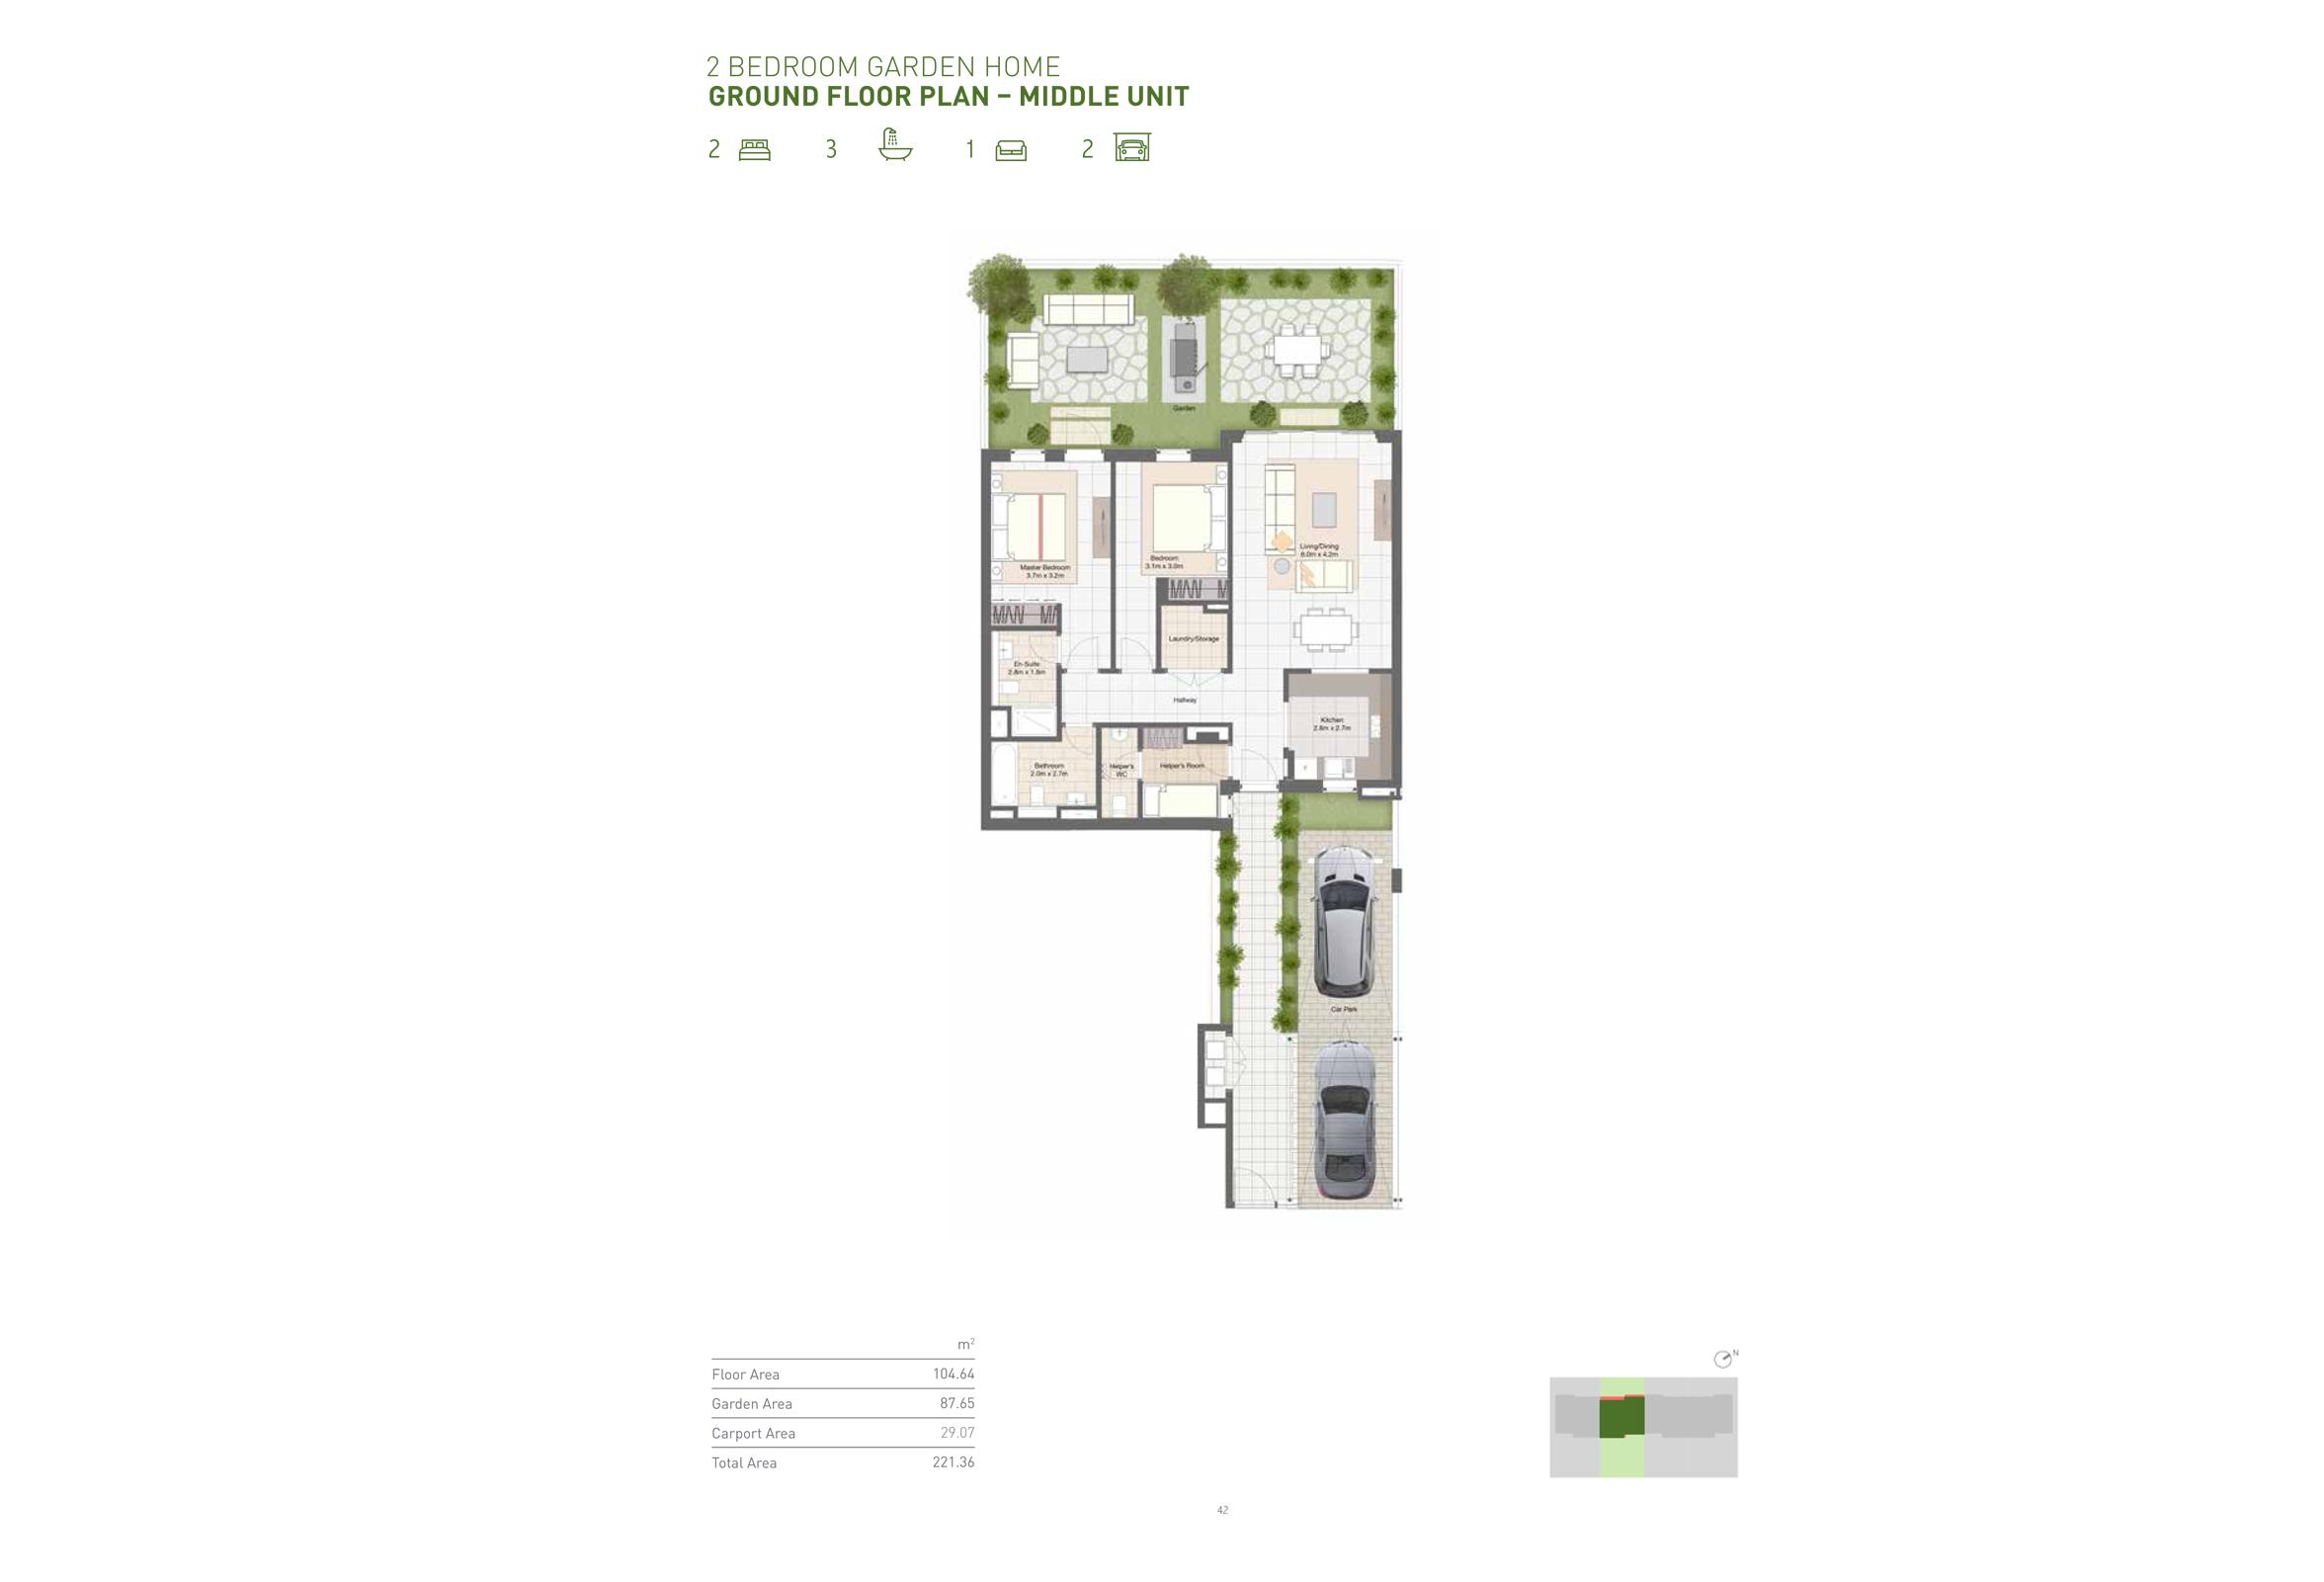 2 Bedroom Garden Home - Ground Floor - Middle Unit  Size 221 Sqm